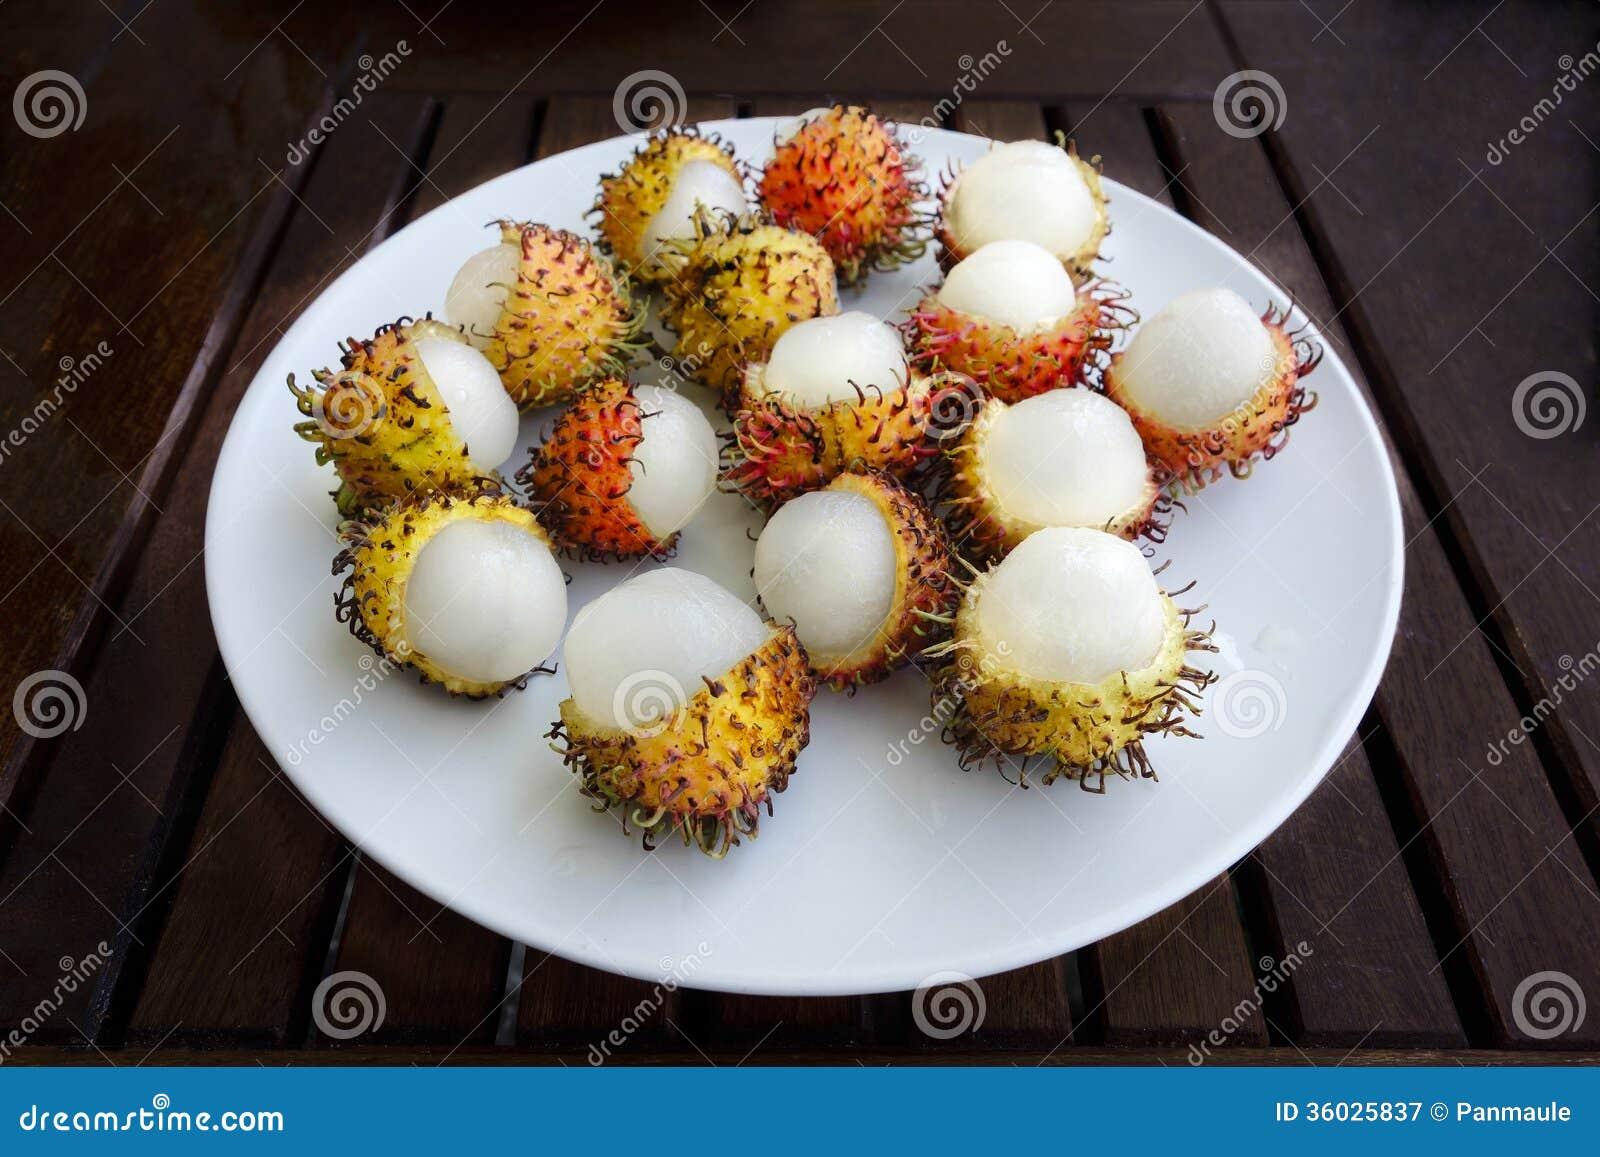 exotic hairy asian rambutan fruit stock image - image of nature